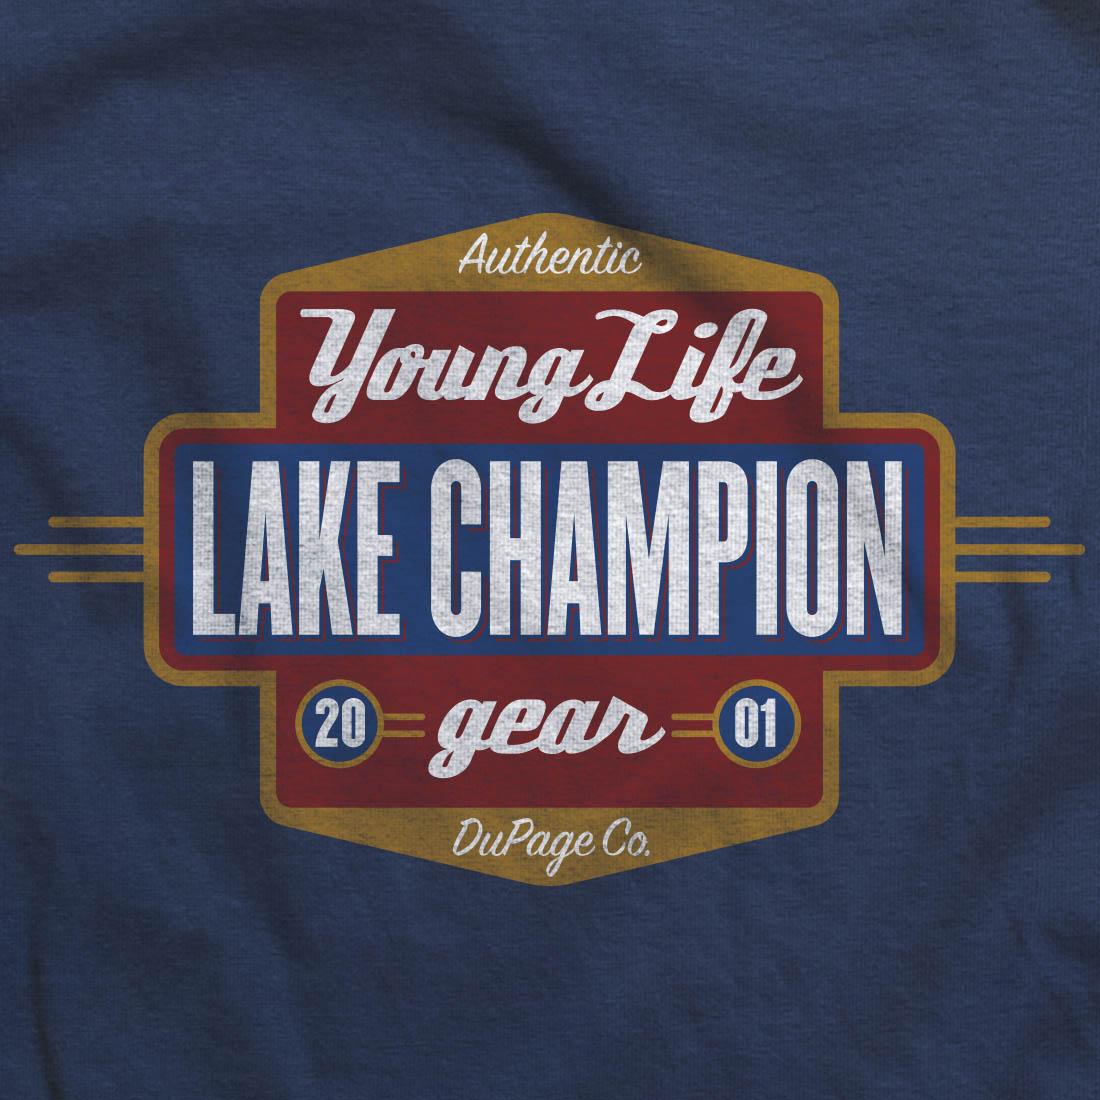 Tshirt-YL-LakeChampion